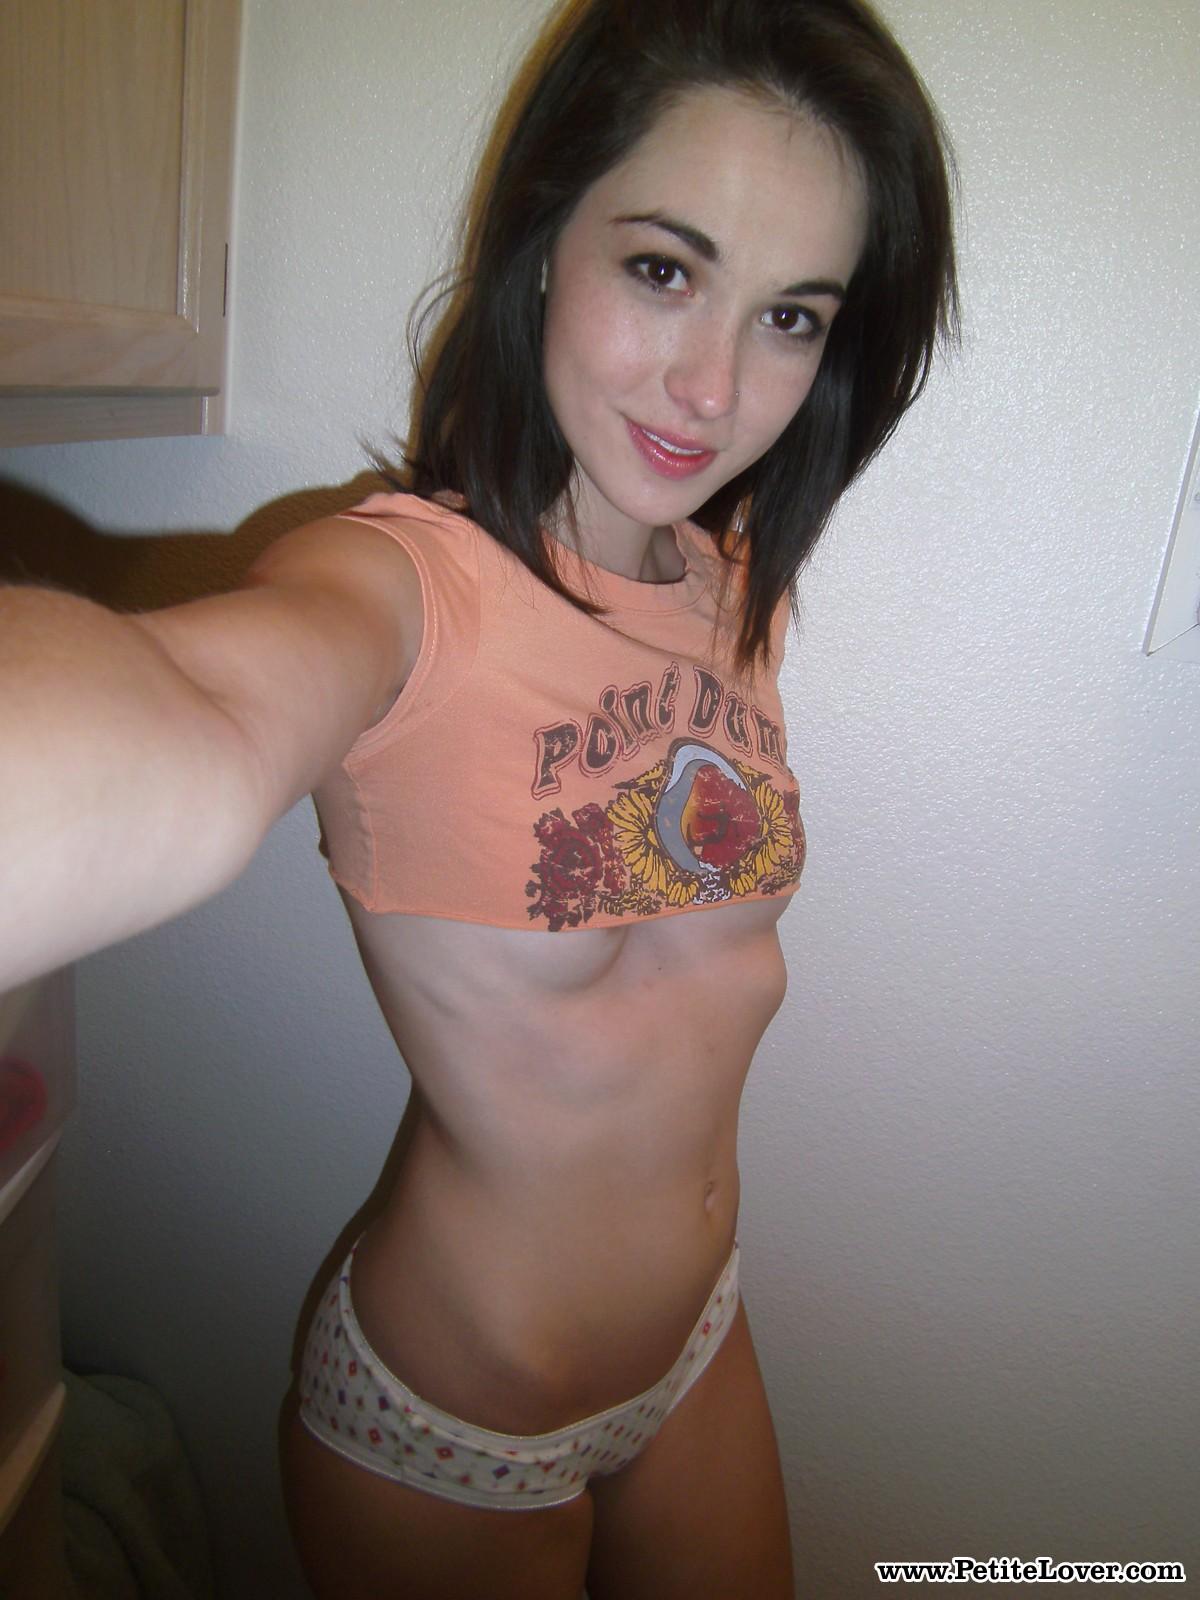 emily-grey-selfshot-teen-naked-pussy-petitelover-02